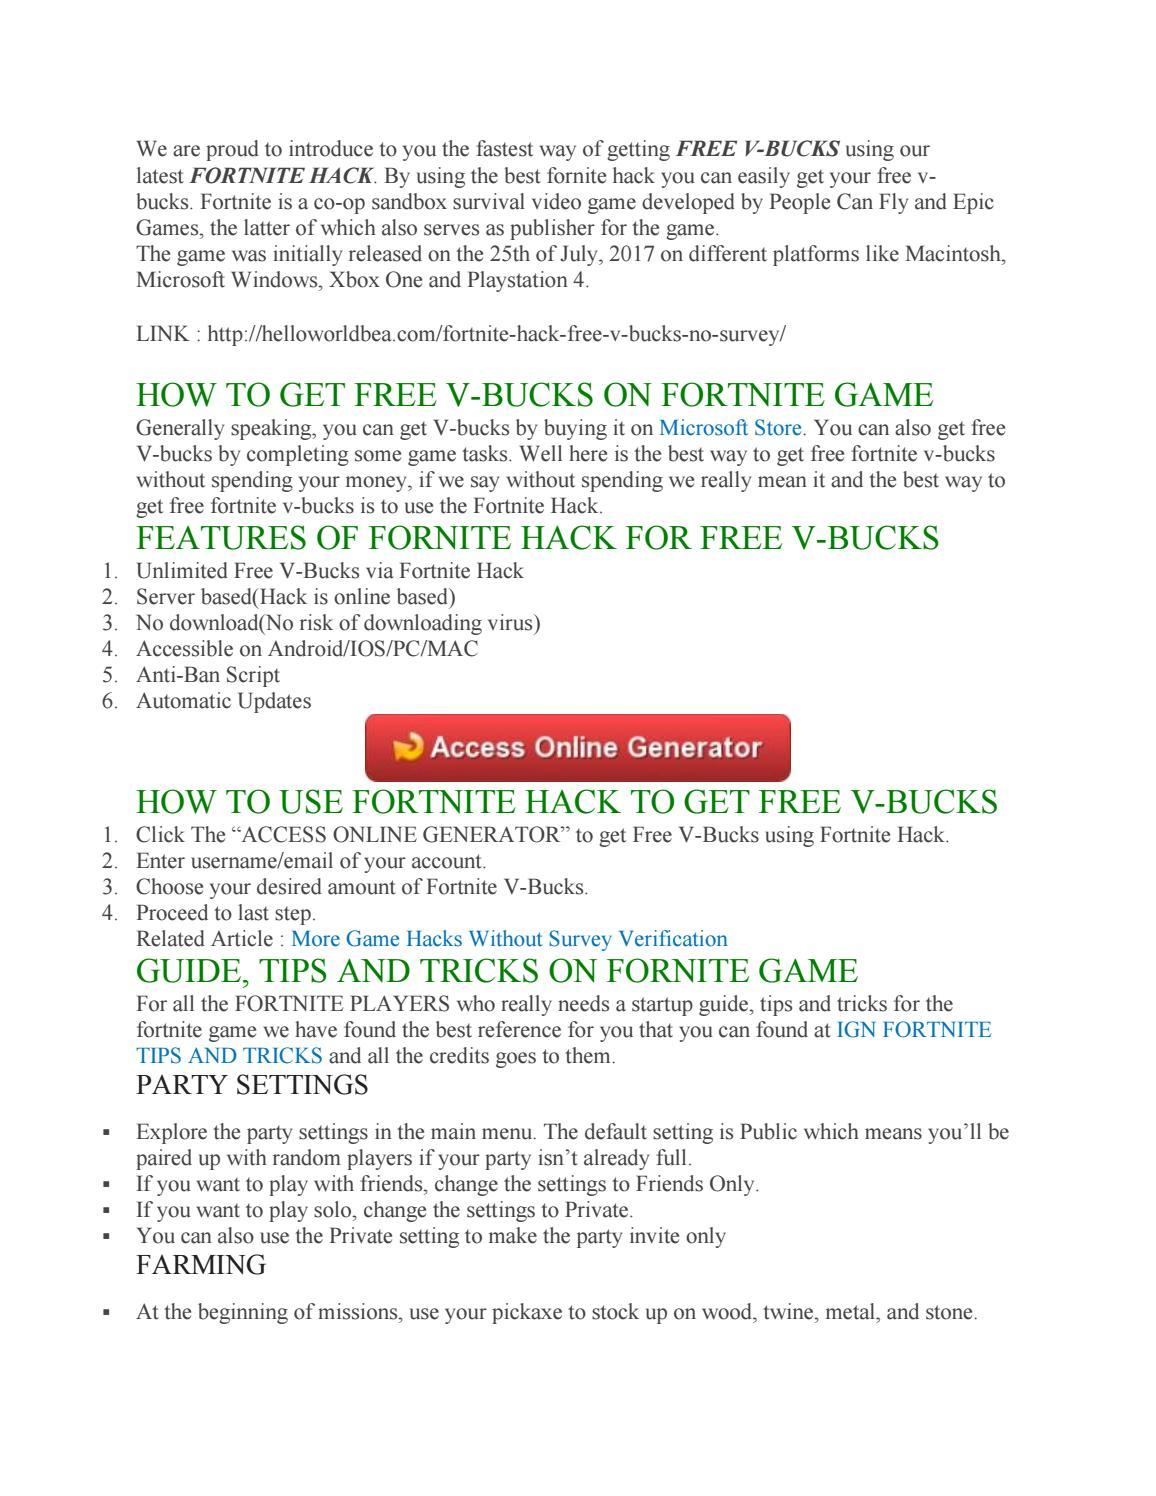 Free Fortnite V Bucks No Survey Glitch By Fortnite Free V Bucks